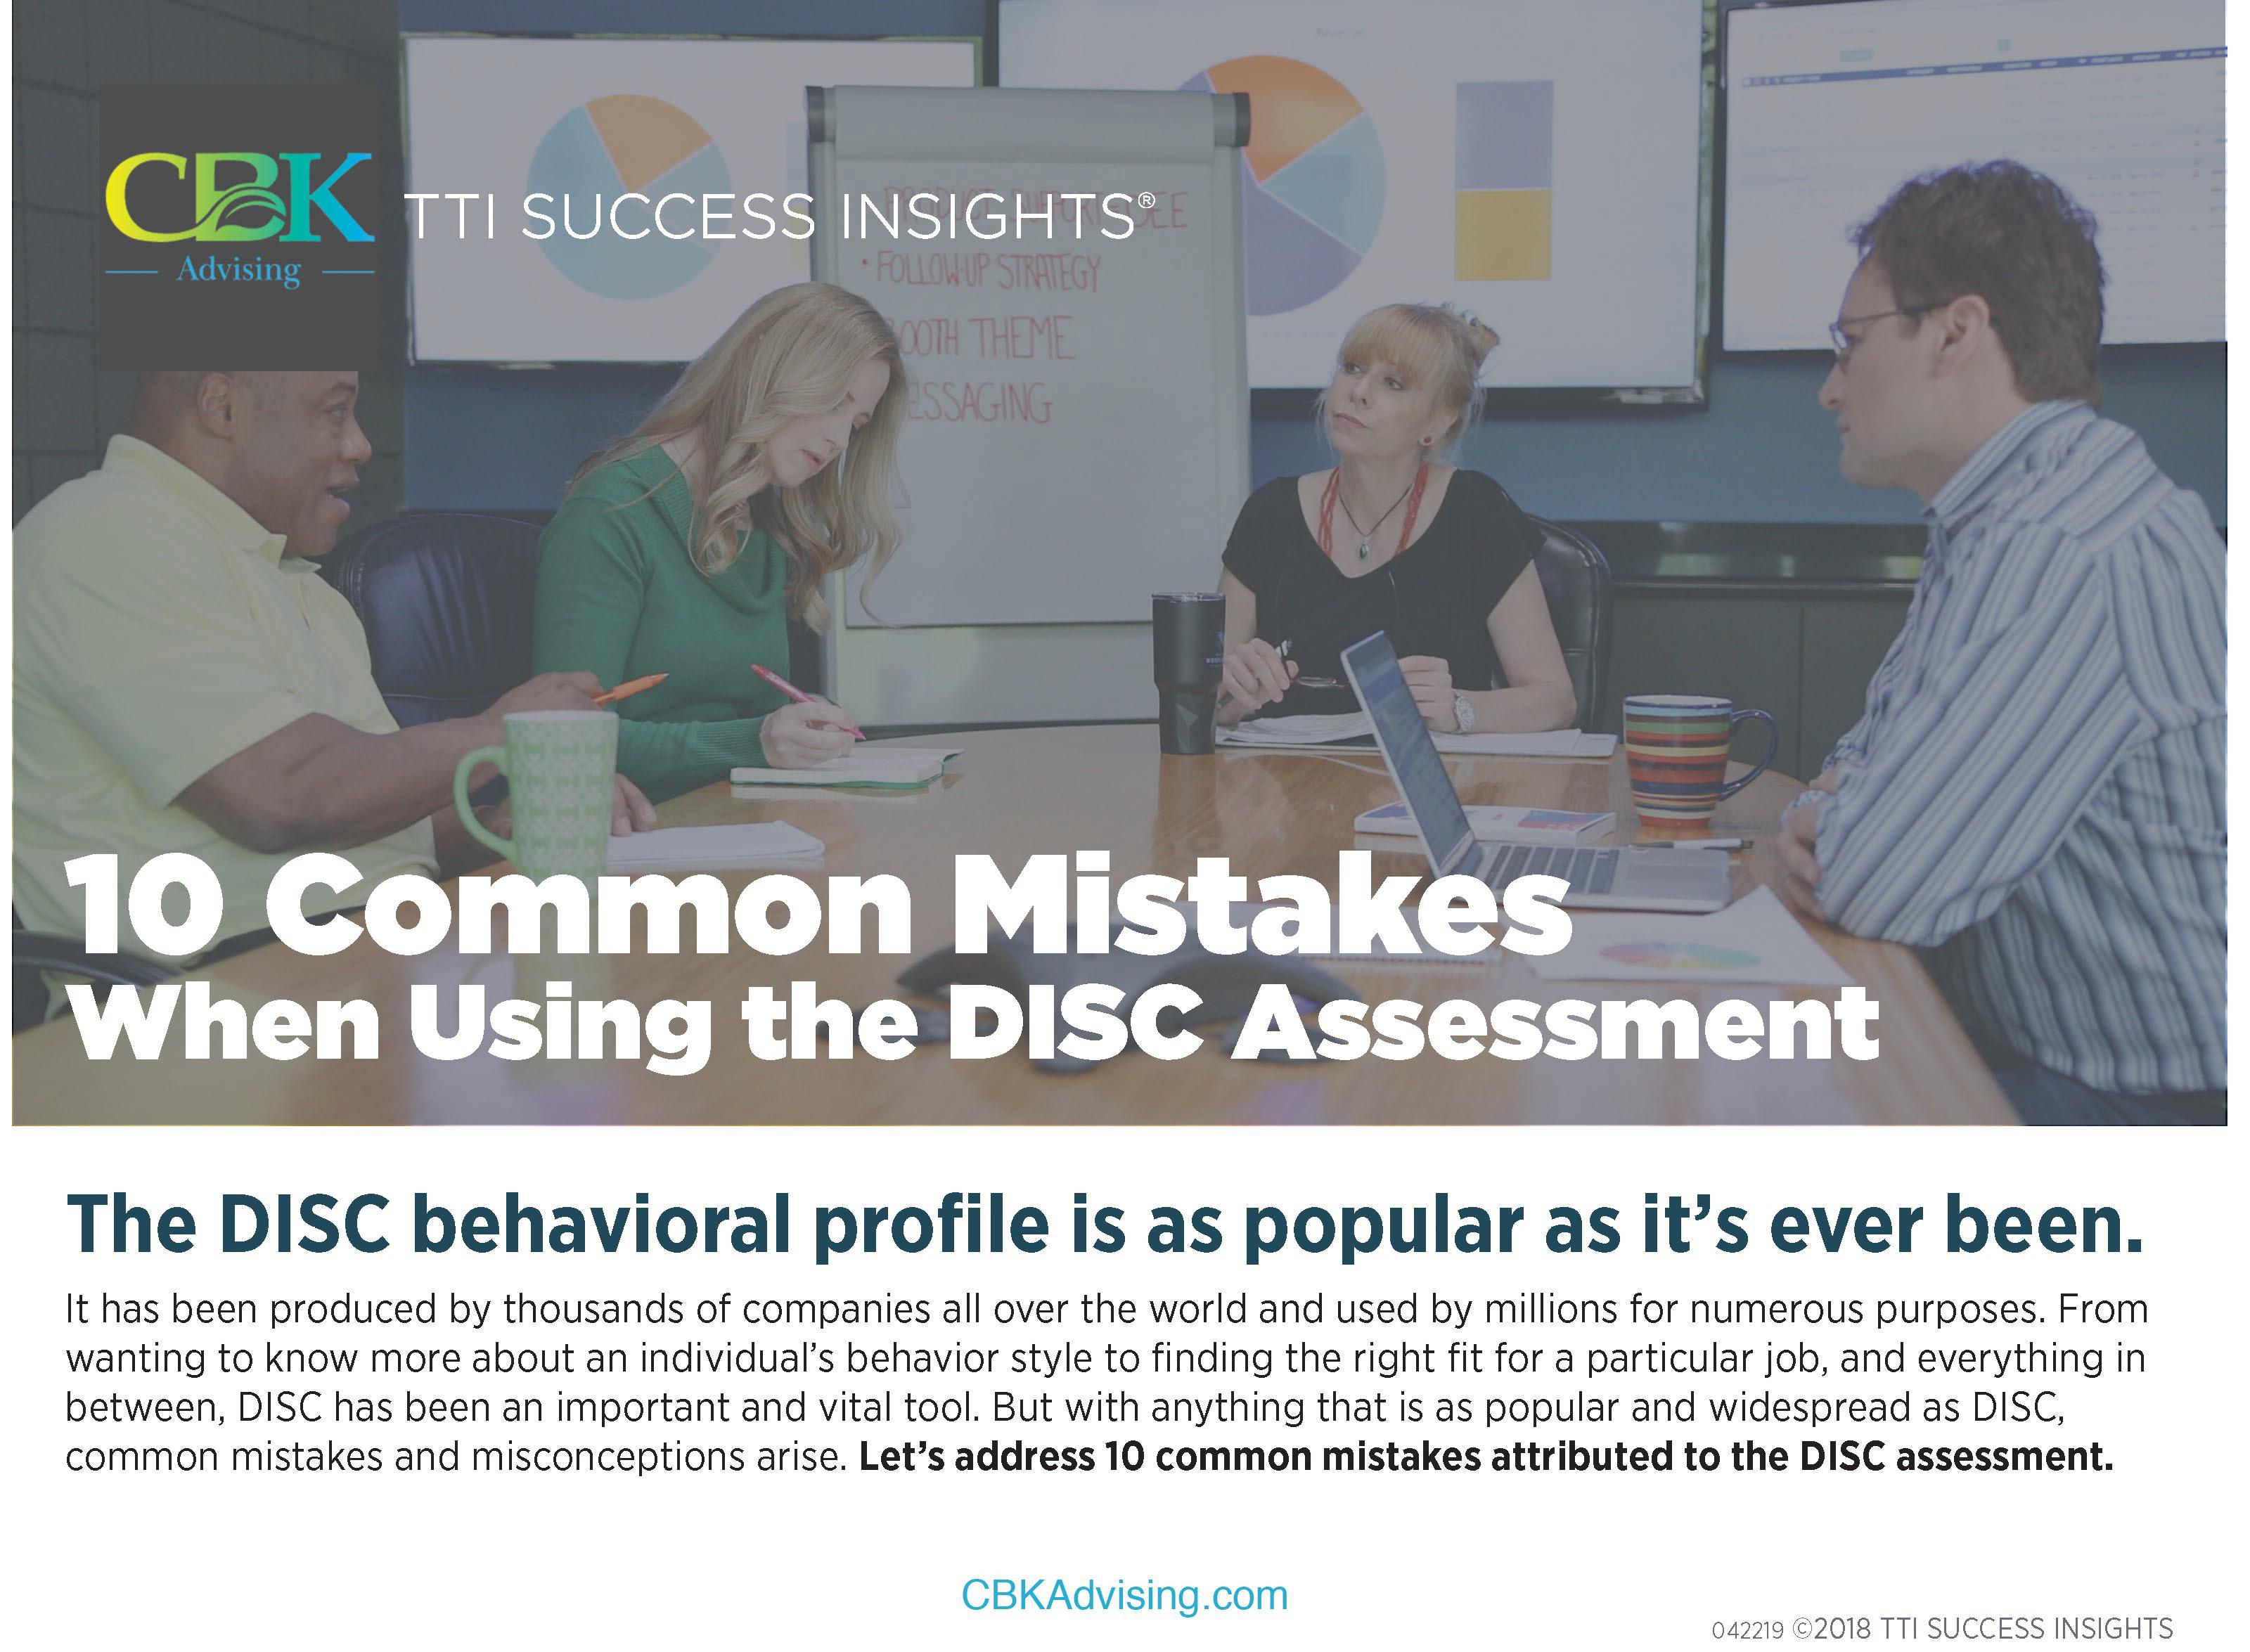 CBK 10 Common Mistakes Using DISC-1